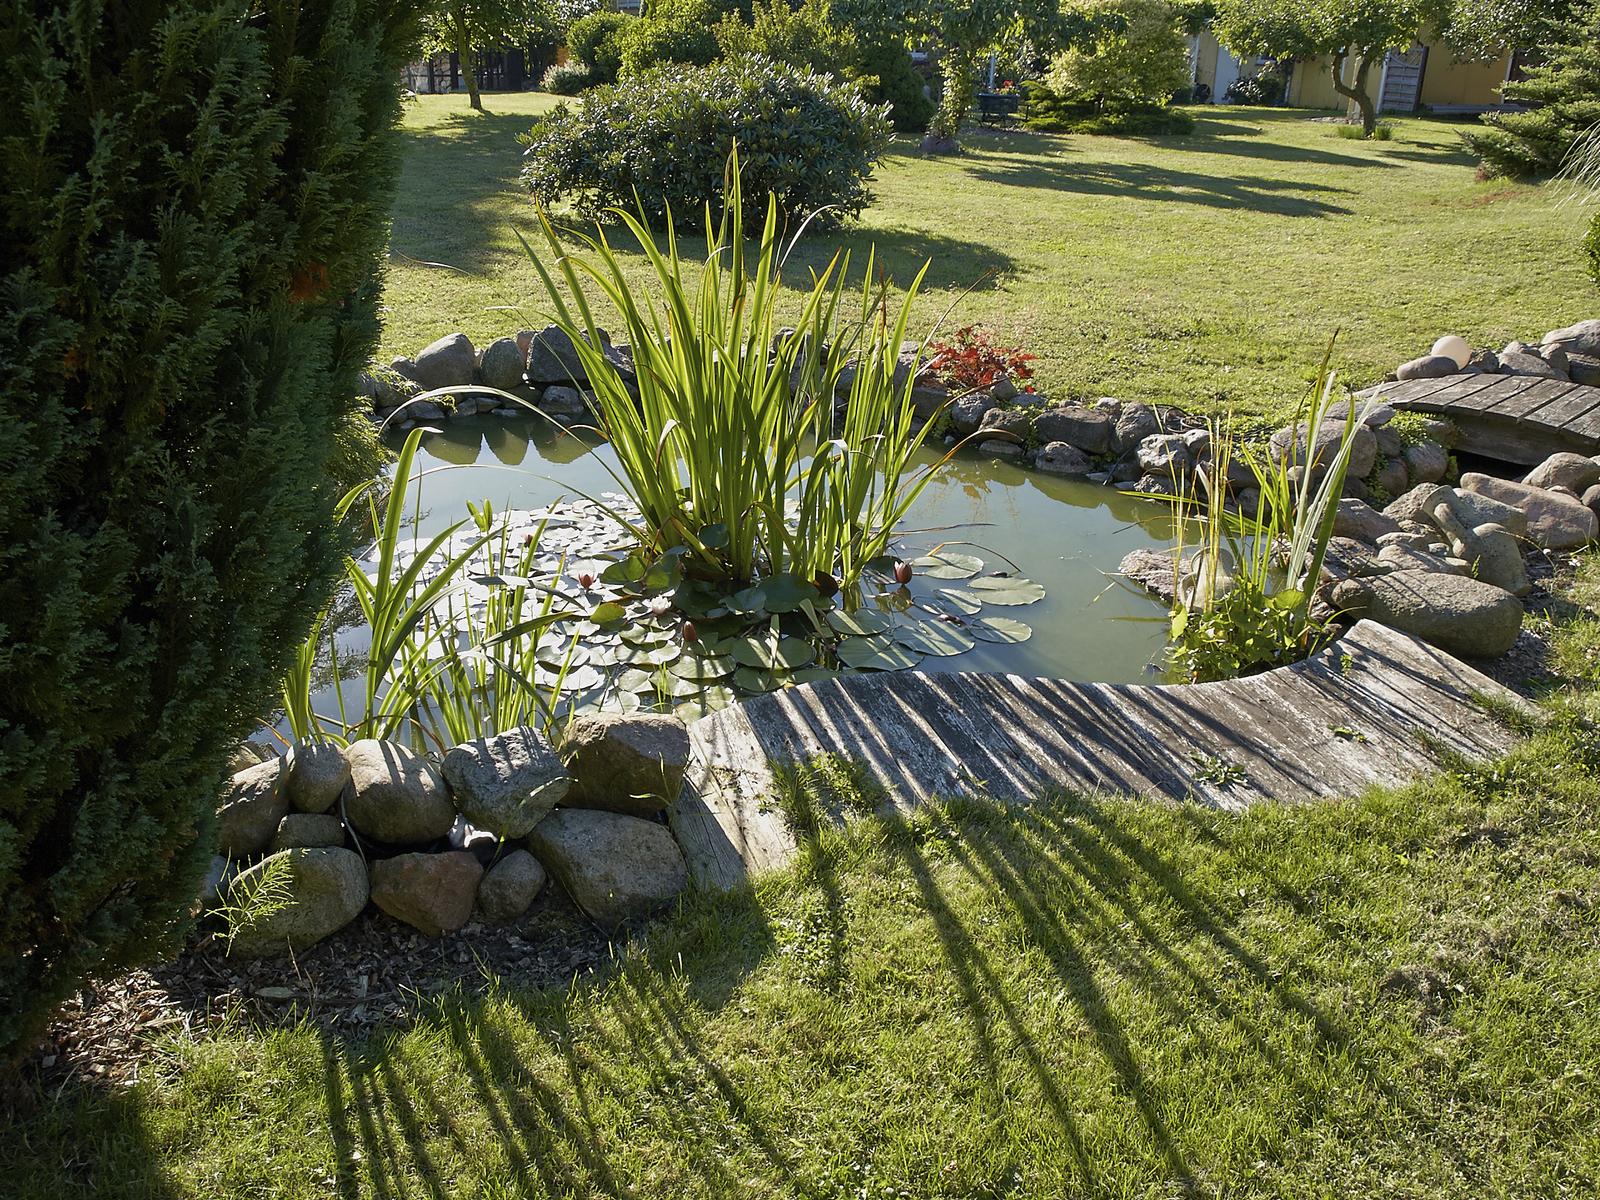 Backyard Pond Fountains water gardens & backyard ponds archives | blain's farm & fleet blog